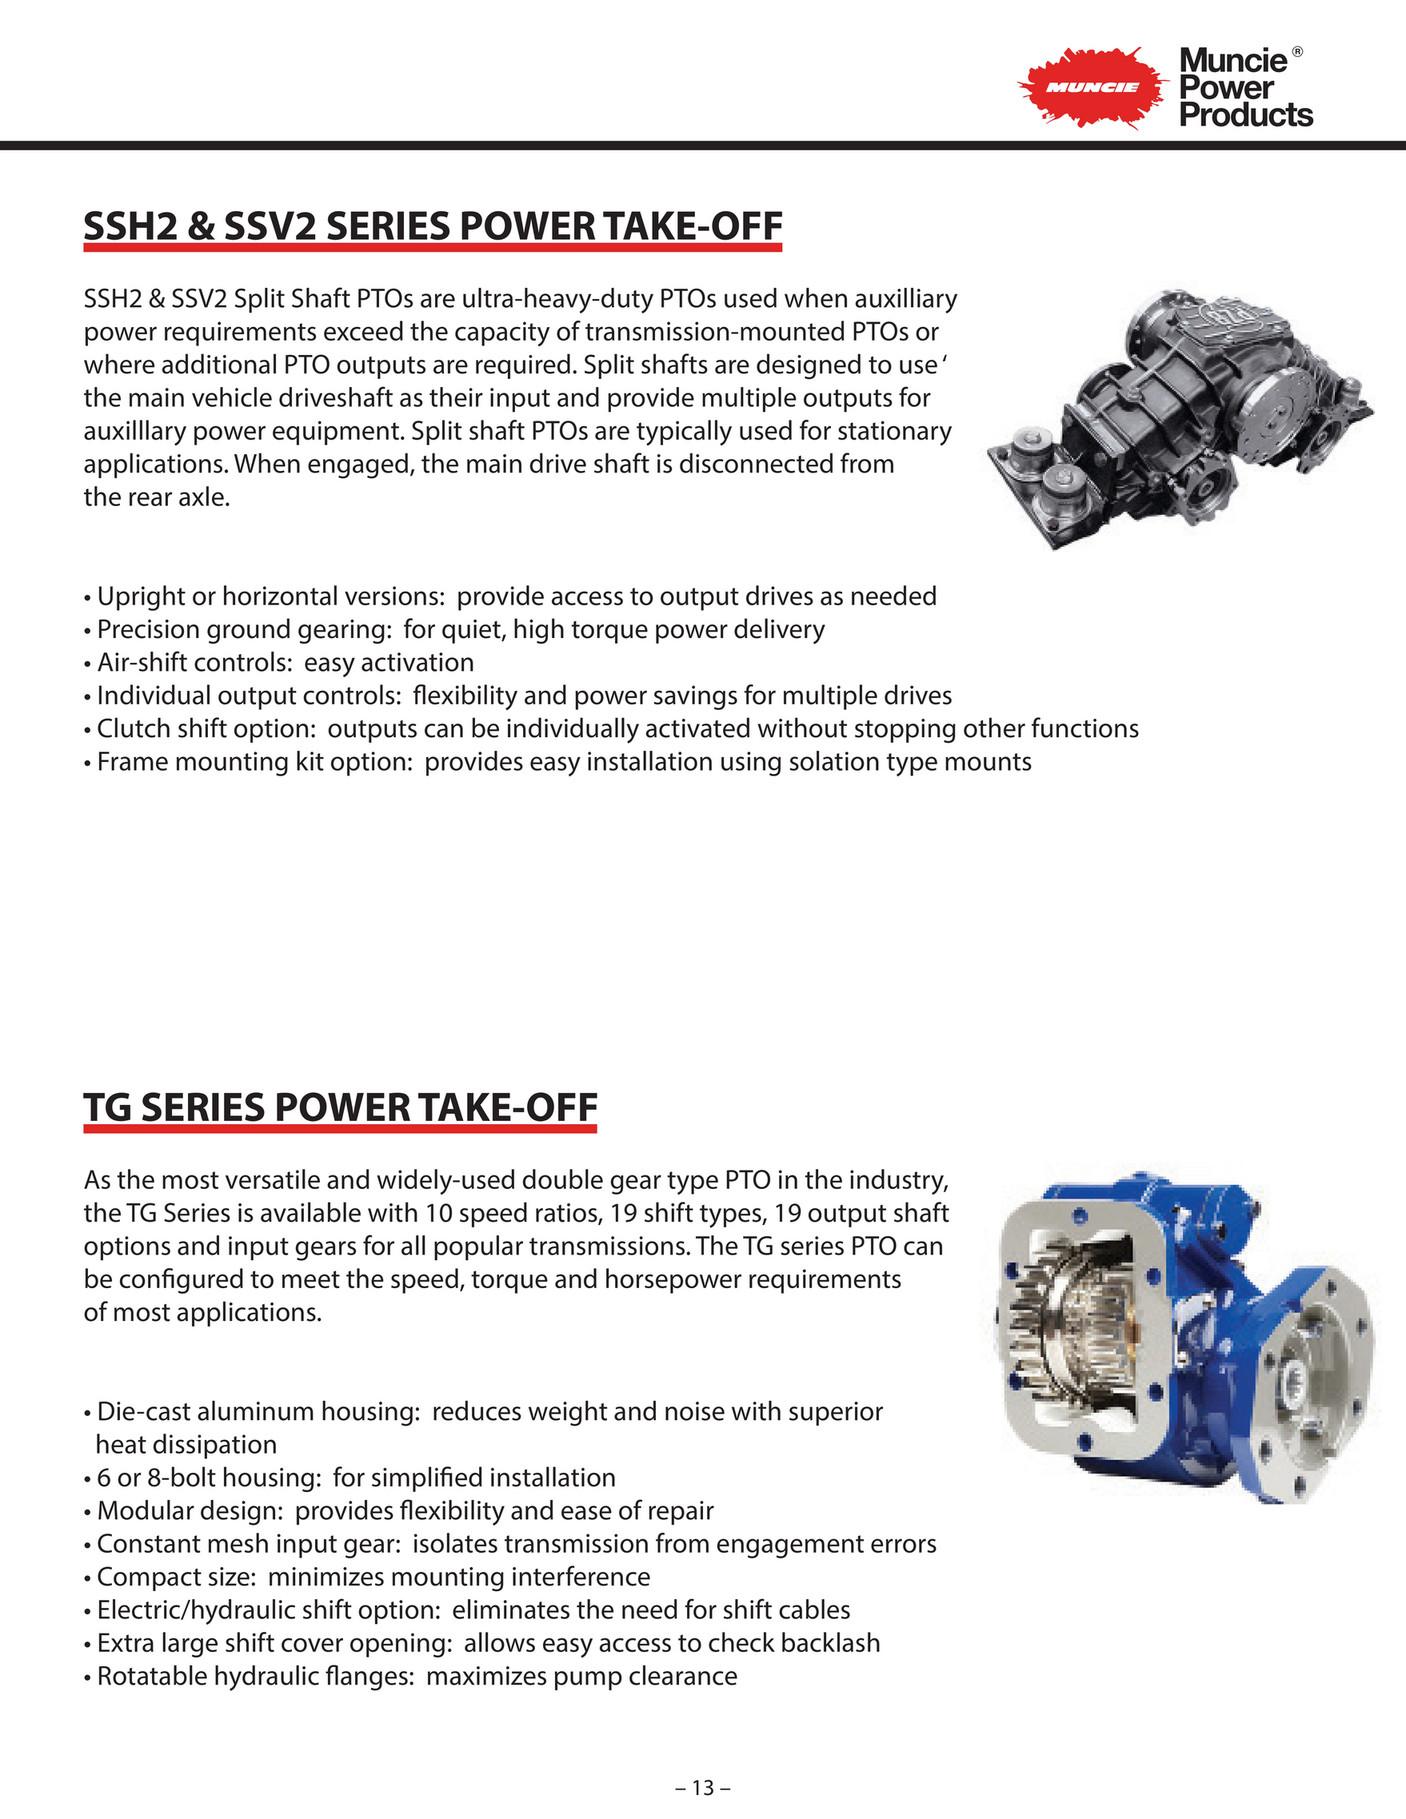 R&M Equipment - Muncie Auxiliary Power Brochure v1 - Page 14